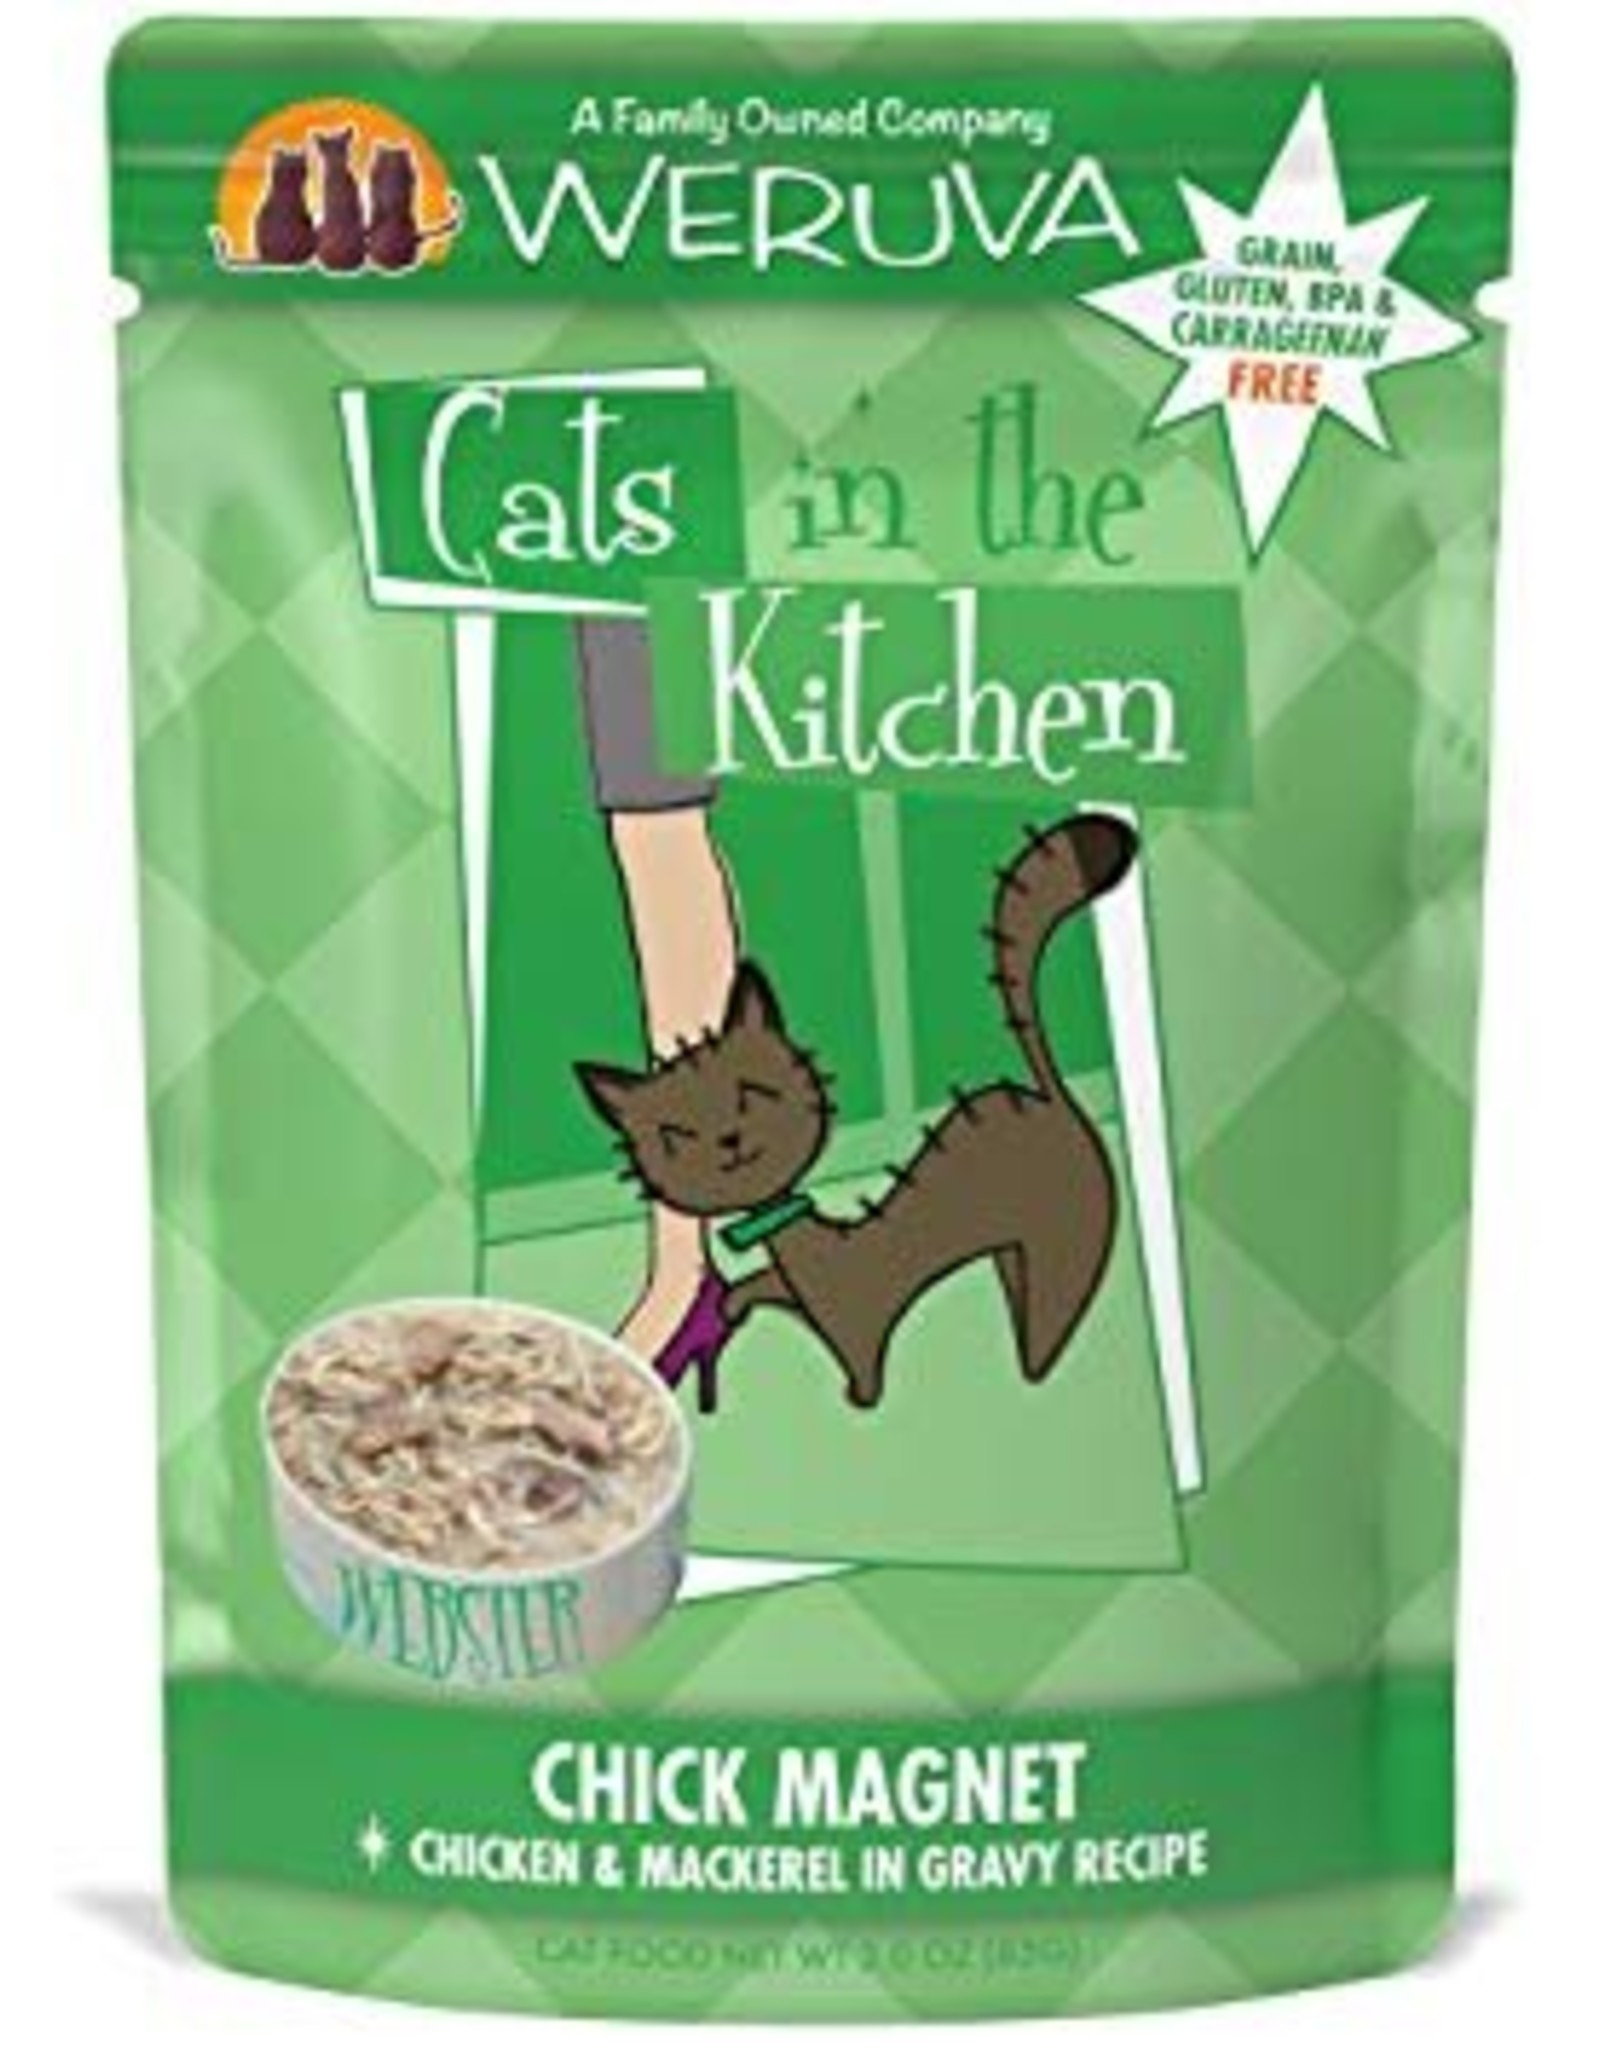 Weruva CITK Chick Magnet Cat Food Pouch, 3 oz.